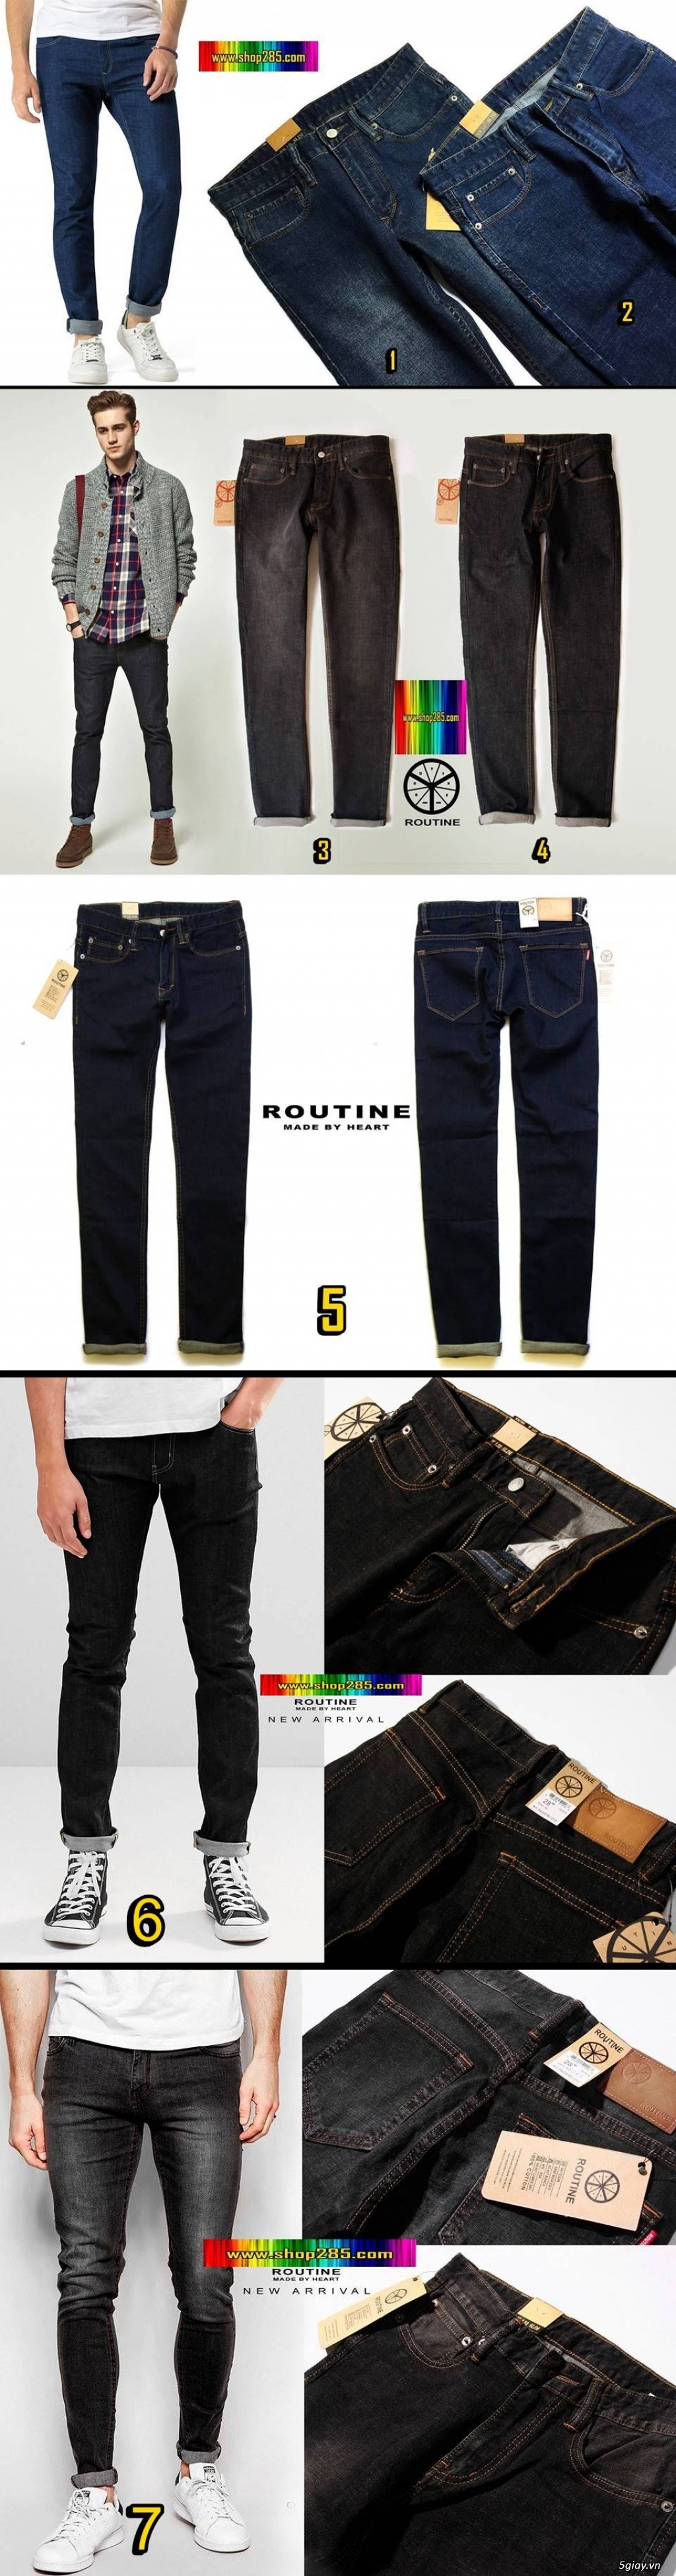 Shop285.com - Shop quần áo : Zara,Jules,Jake*s,,Hollister,Aber,CK,Tommy,Levis - 19